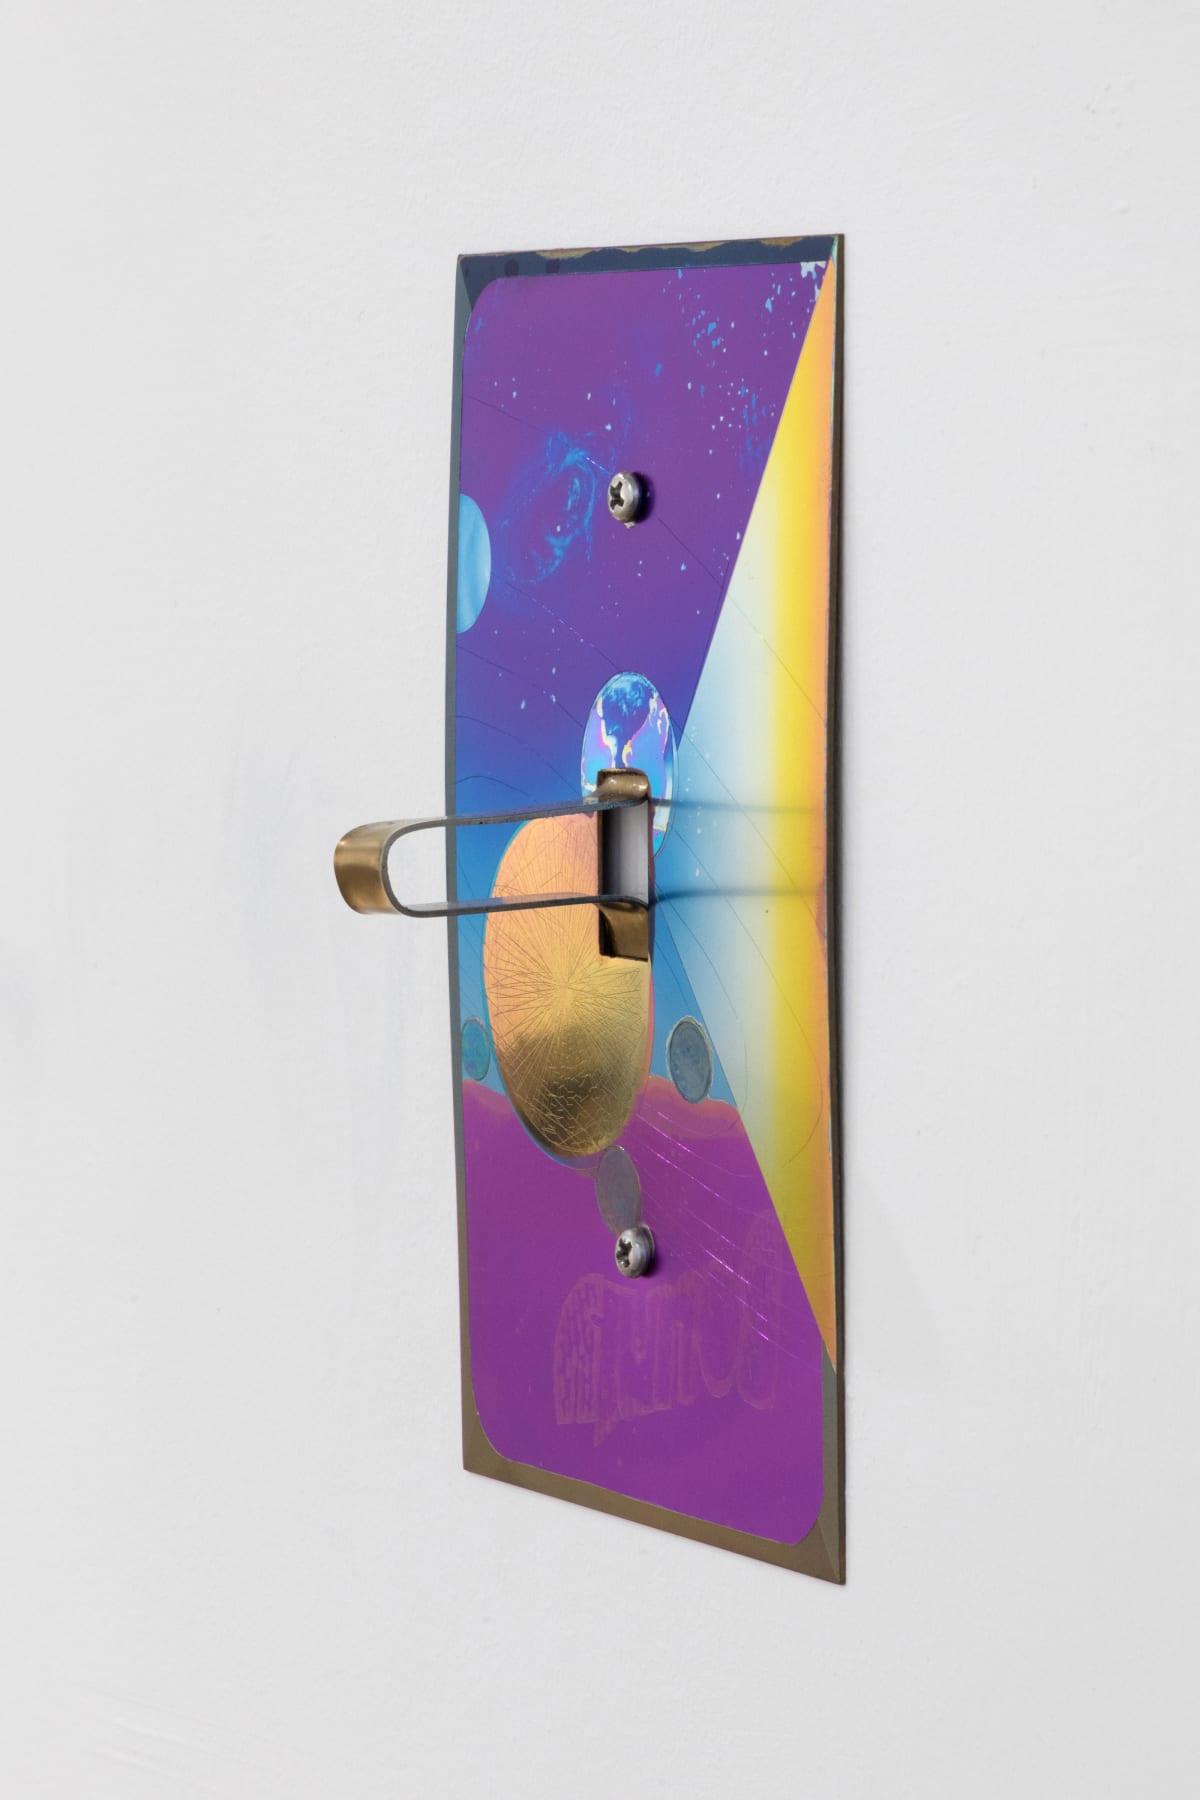 Nathaniel de Large 1 Gang, 2019 Anodized titanium 6 1/2 x 4 x 2 1/2 in 16.5 x 10.2 x 6.3 cm